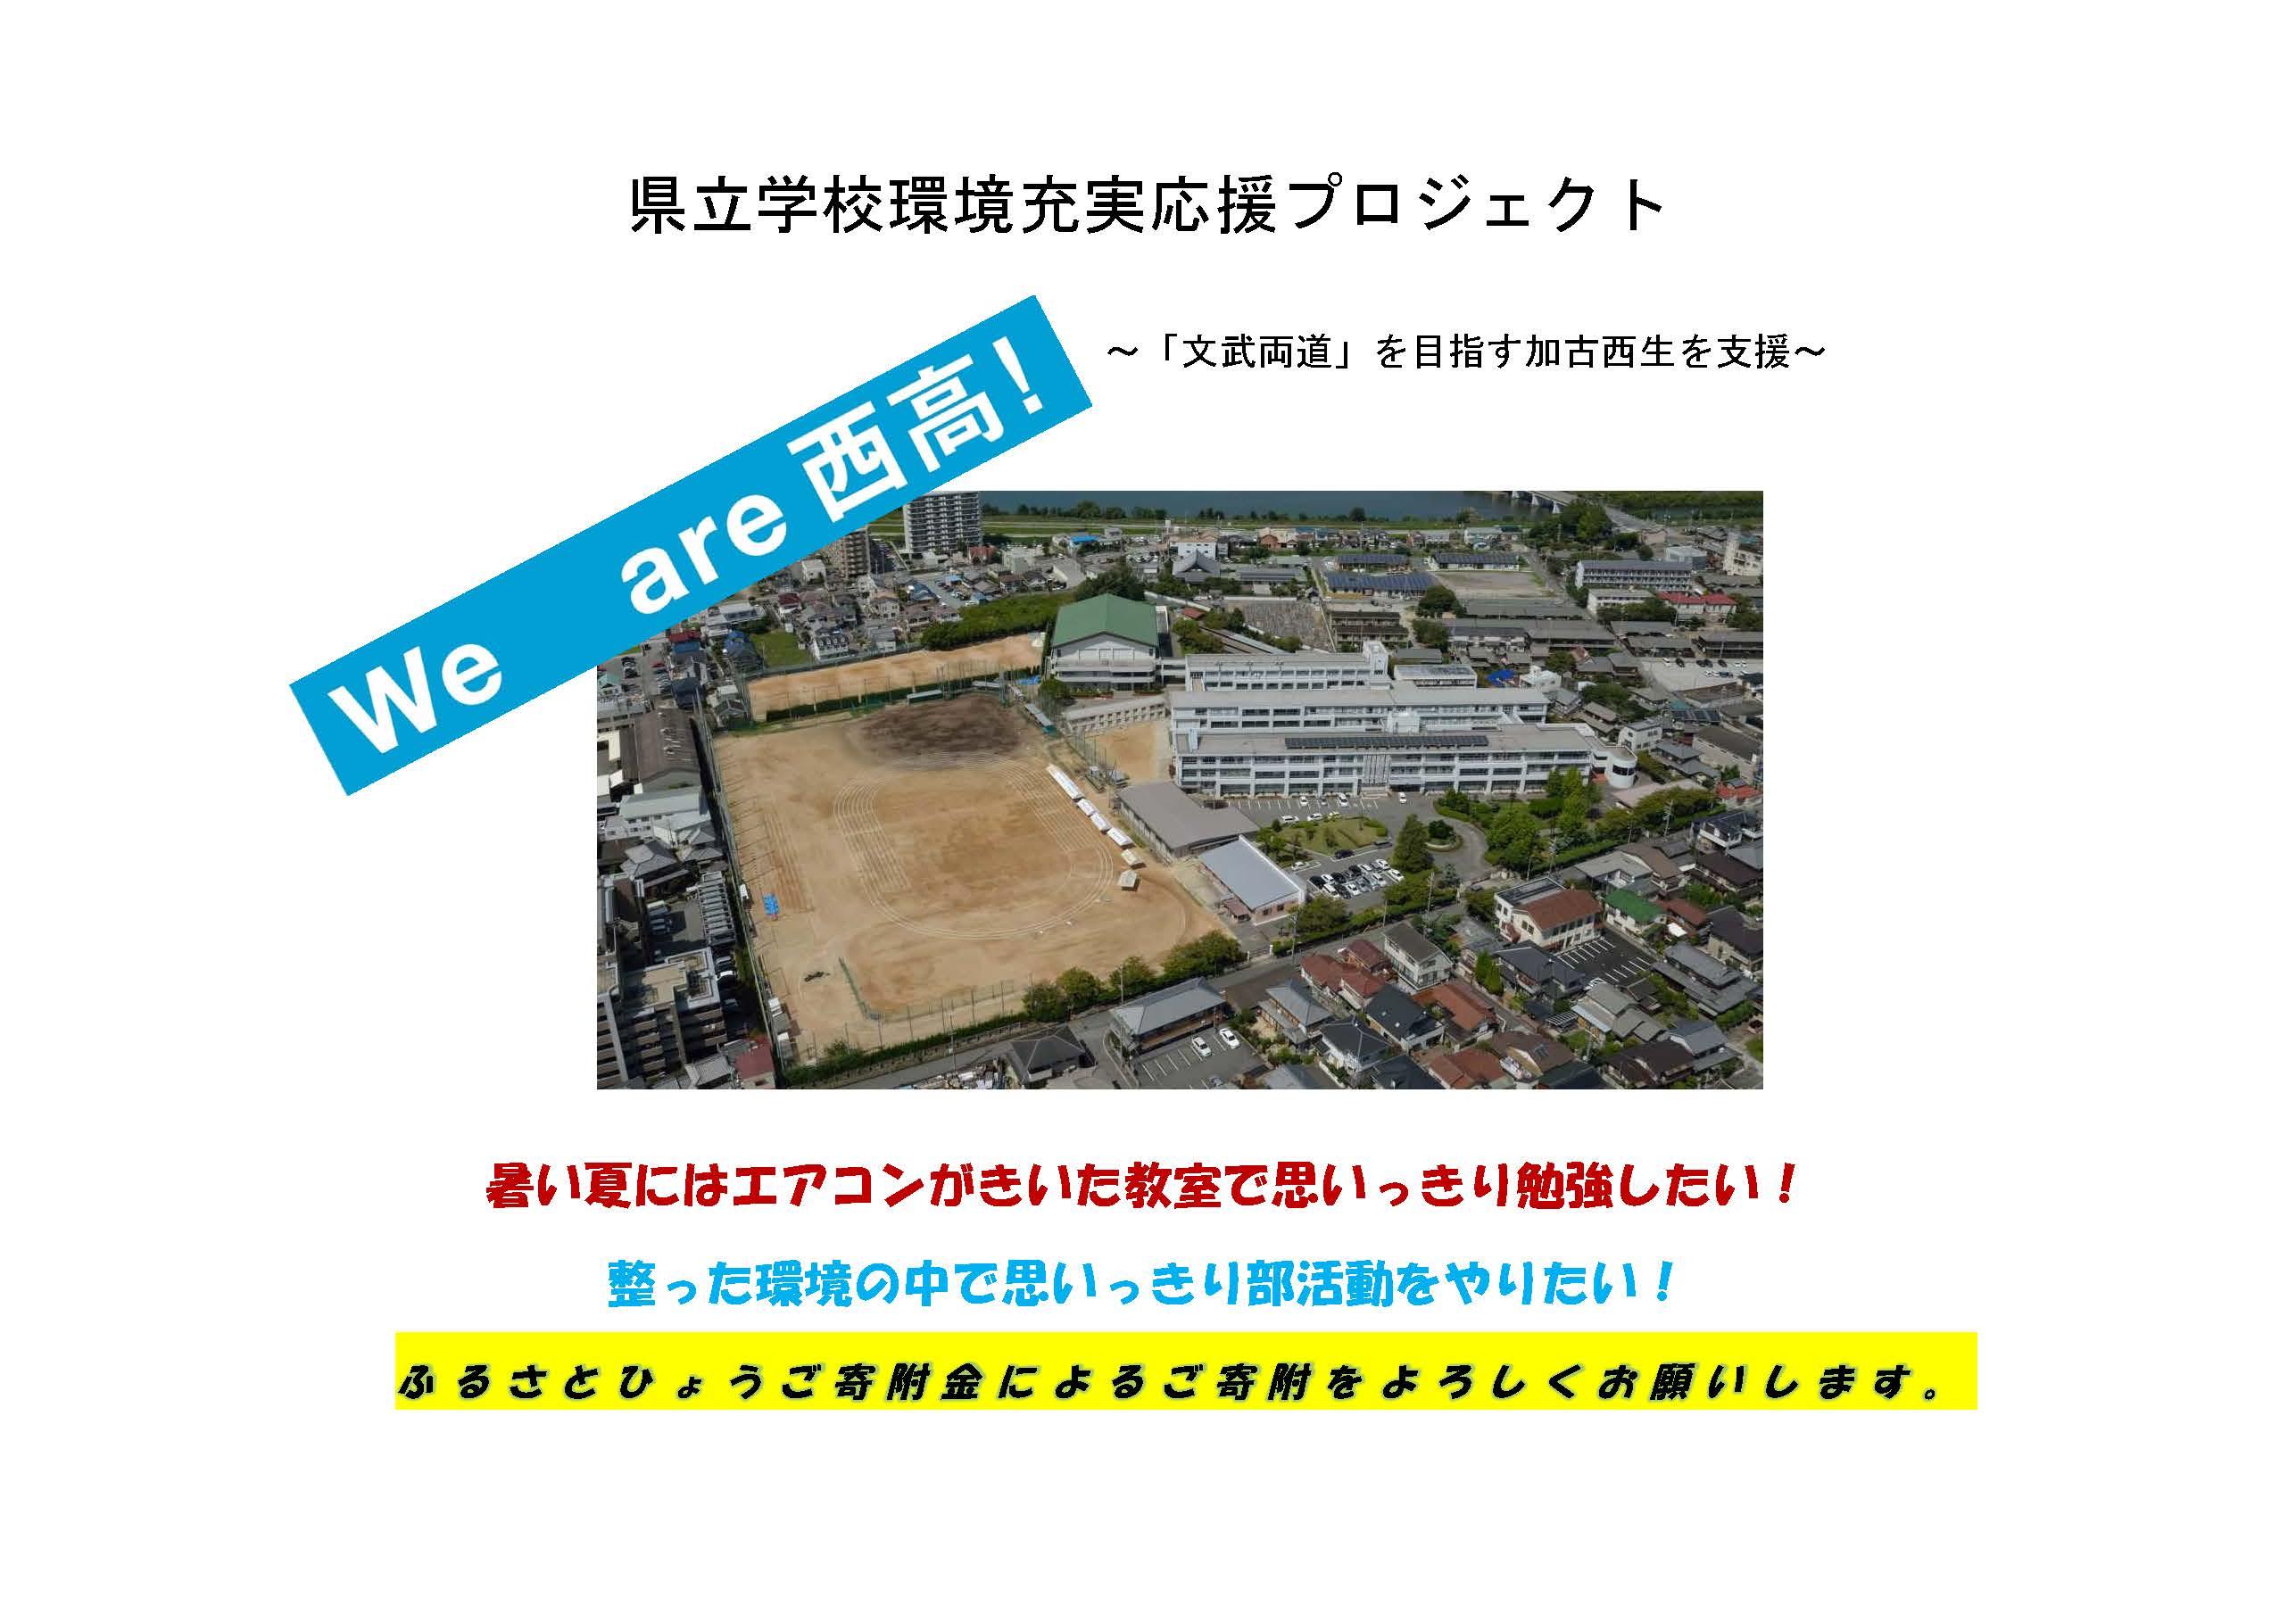 『県立学校環境充実応援プロジェクト』(育友会用)